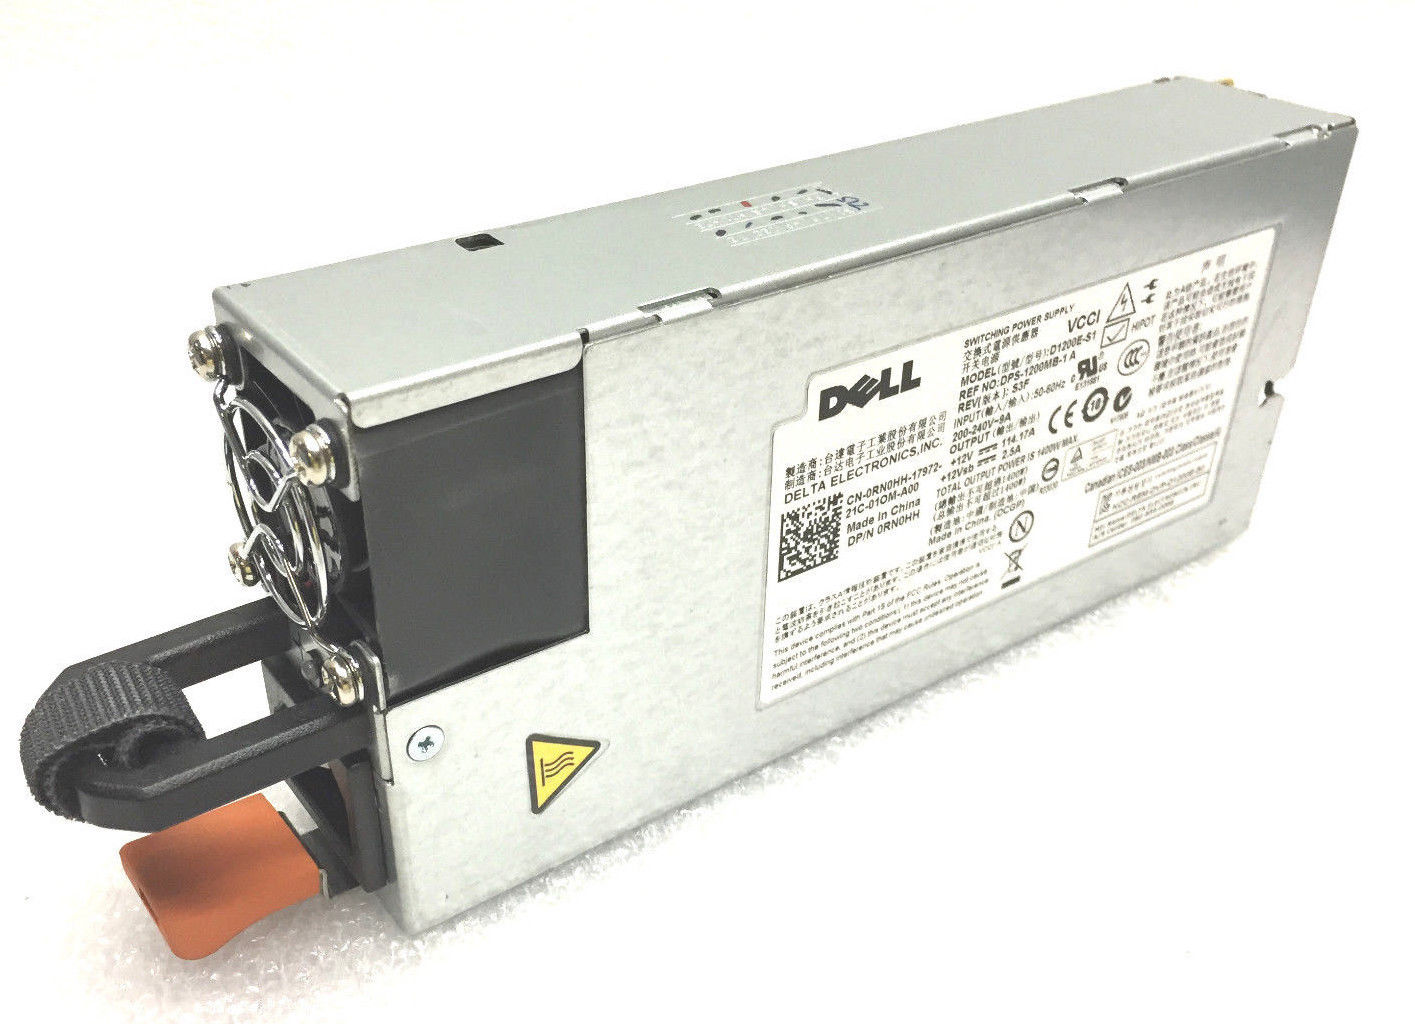 Dell PowerEdge C6220 1400W Watt Hot Swap Power Supply (RN0HH)